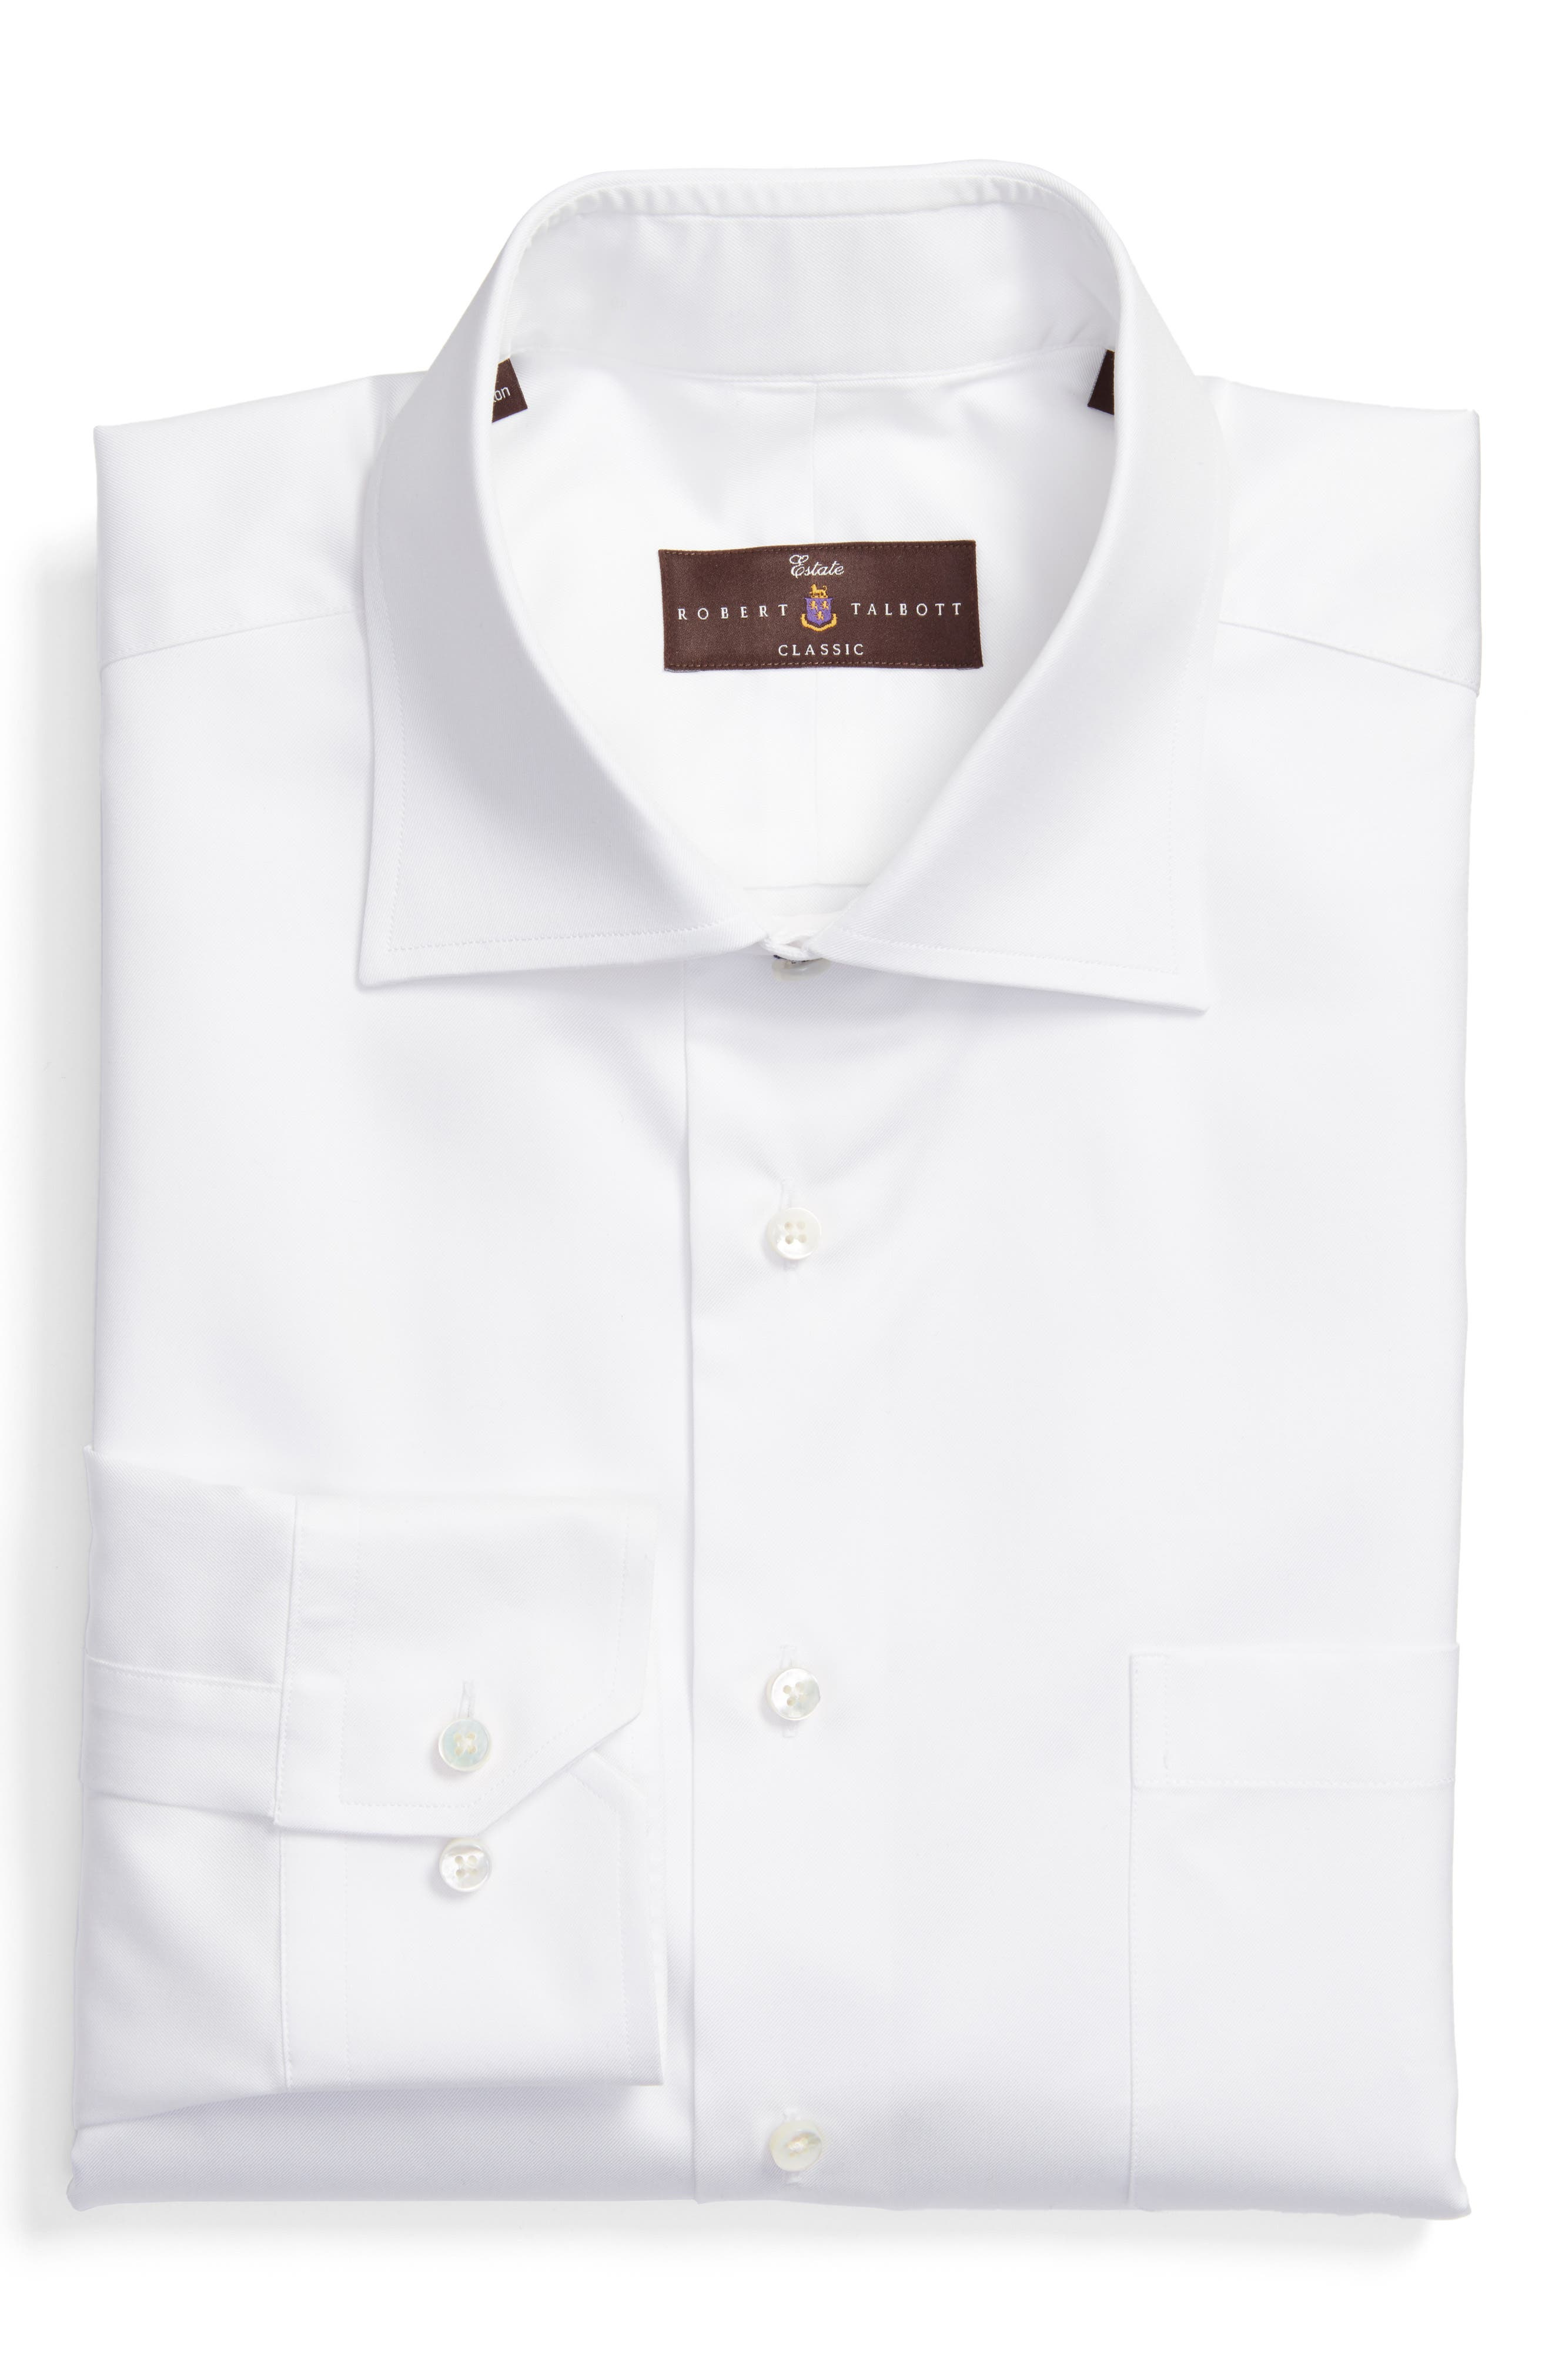 Classic Fit Dress Shirt,                             Main thumbnail 1, color,                             White